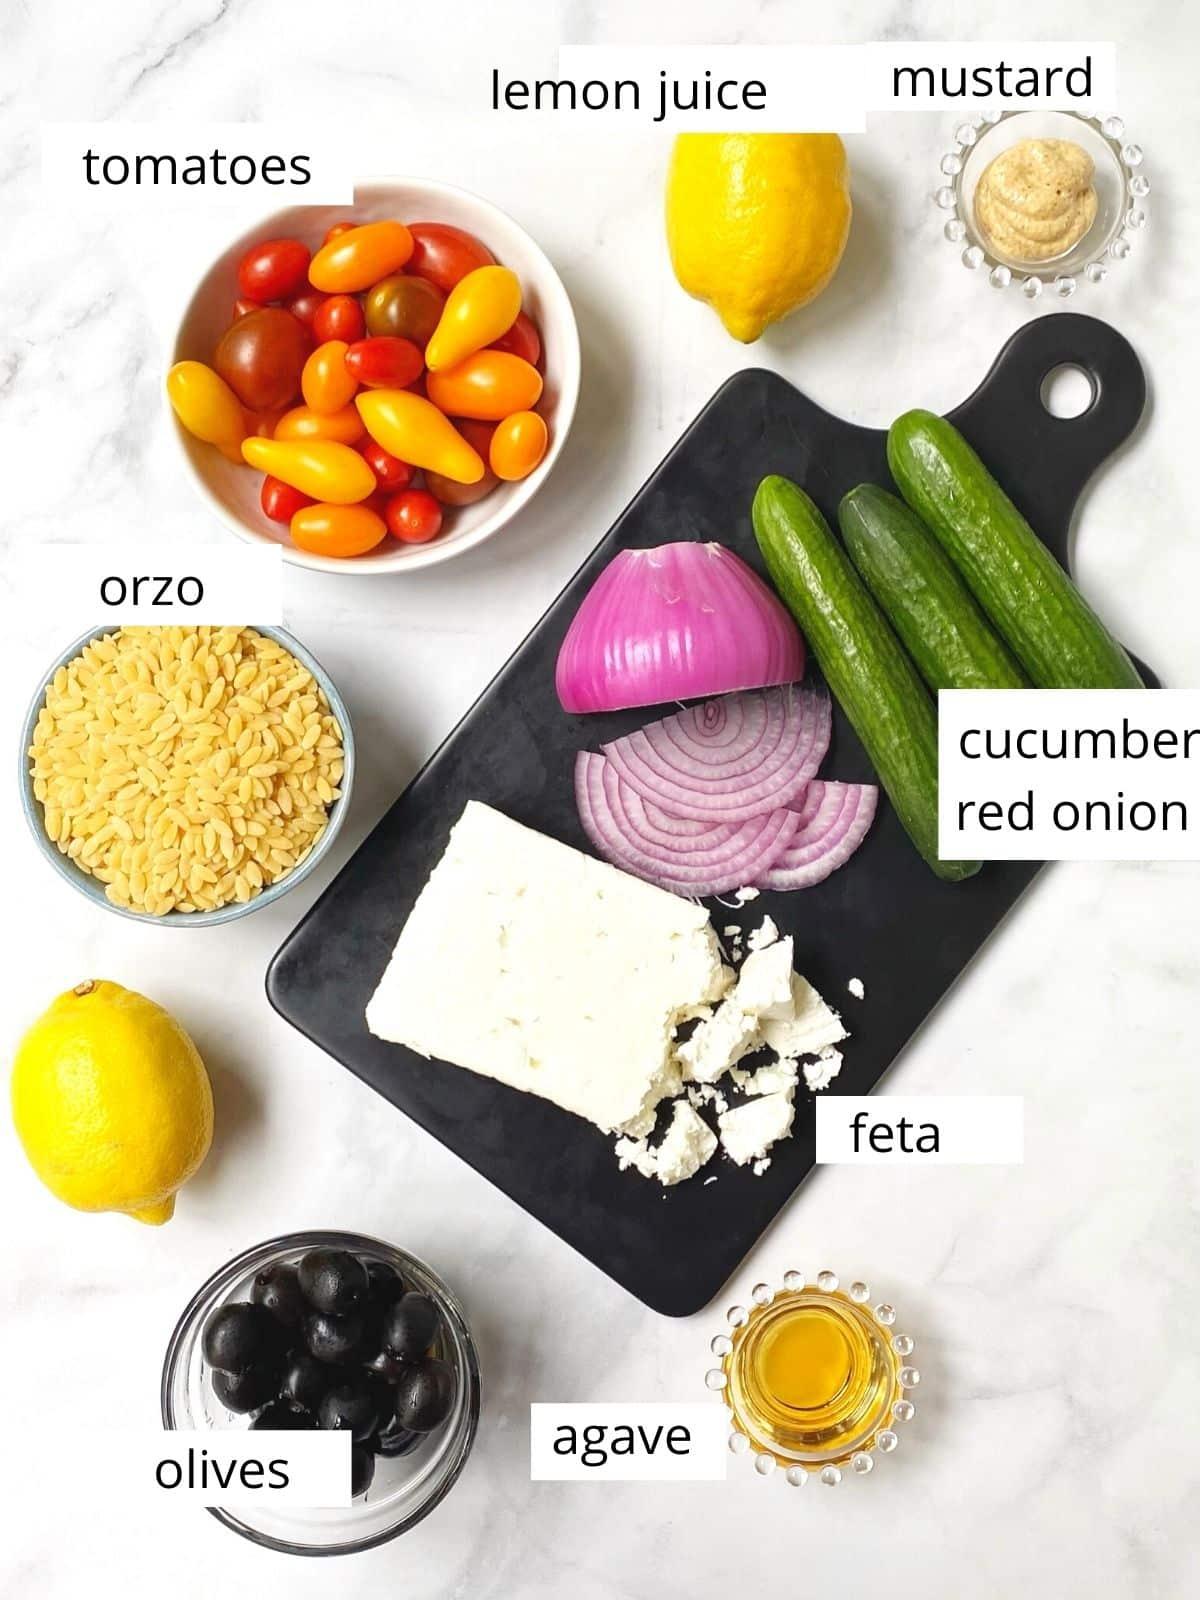 ingredients - tomatoes, orzo, cucumber, onion, olives, feta, lemon juice, mustard, agave